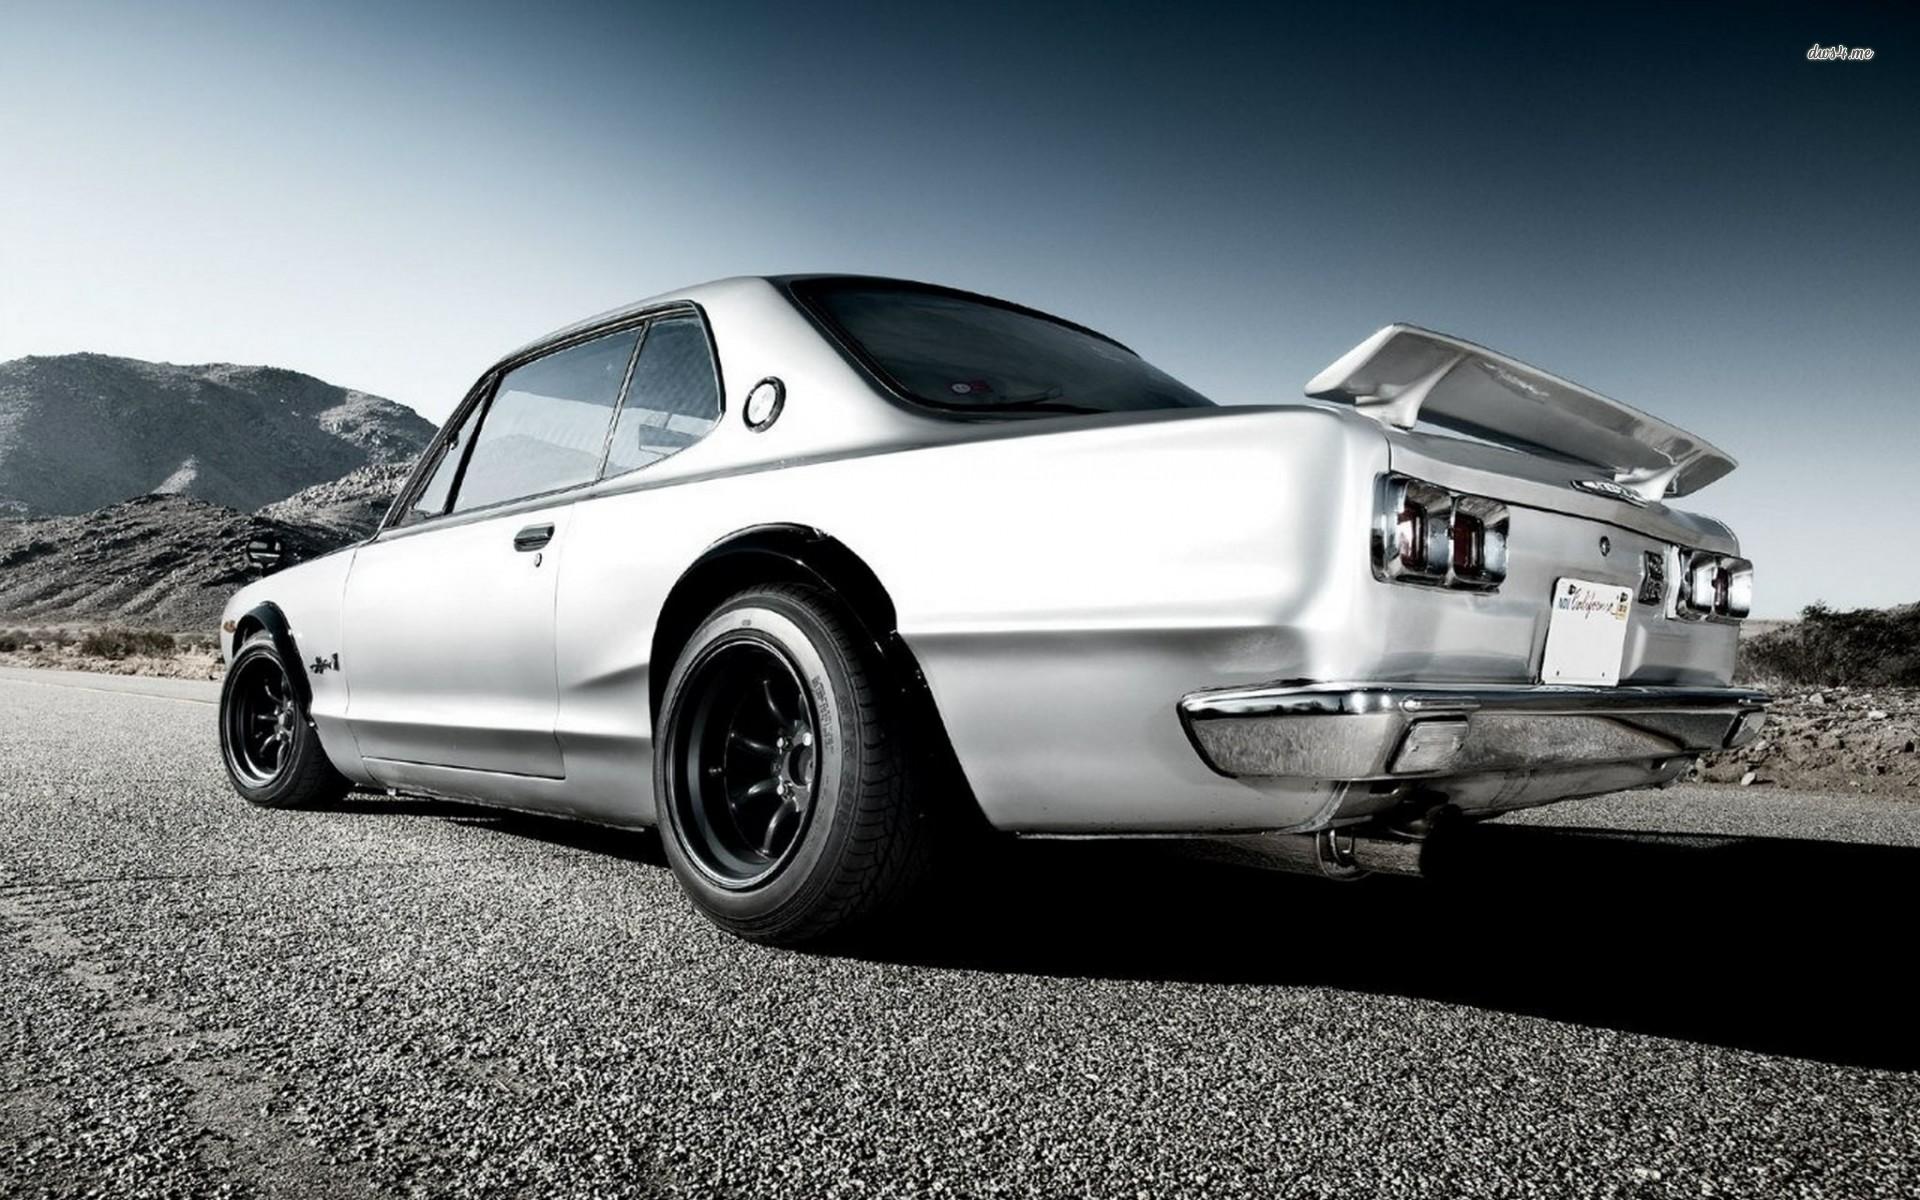 Res: 1920x1200, ... Nissan Skyline GT-R wallpaper  ...